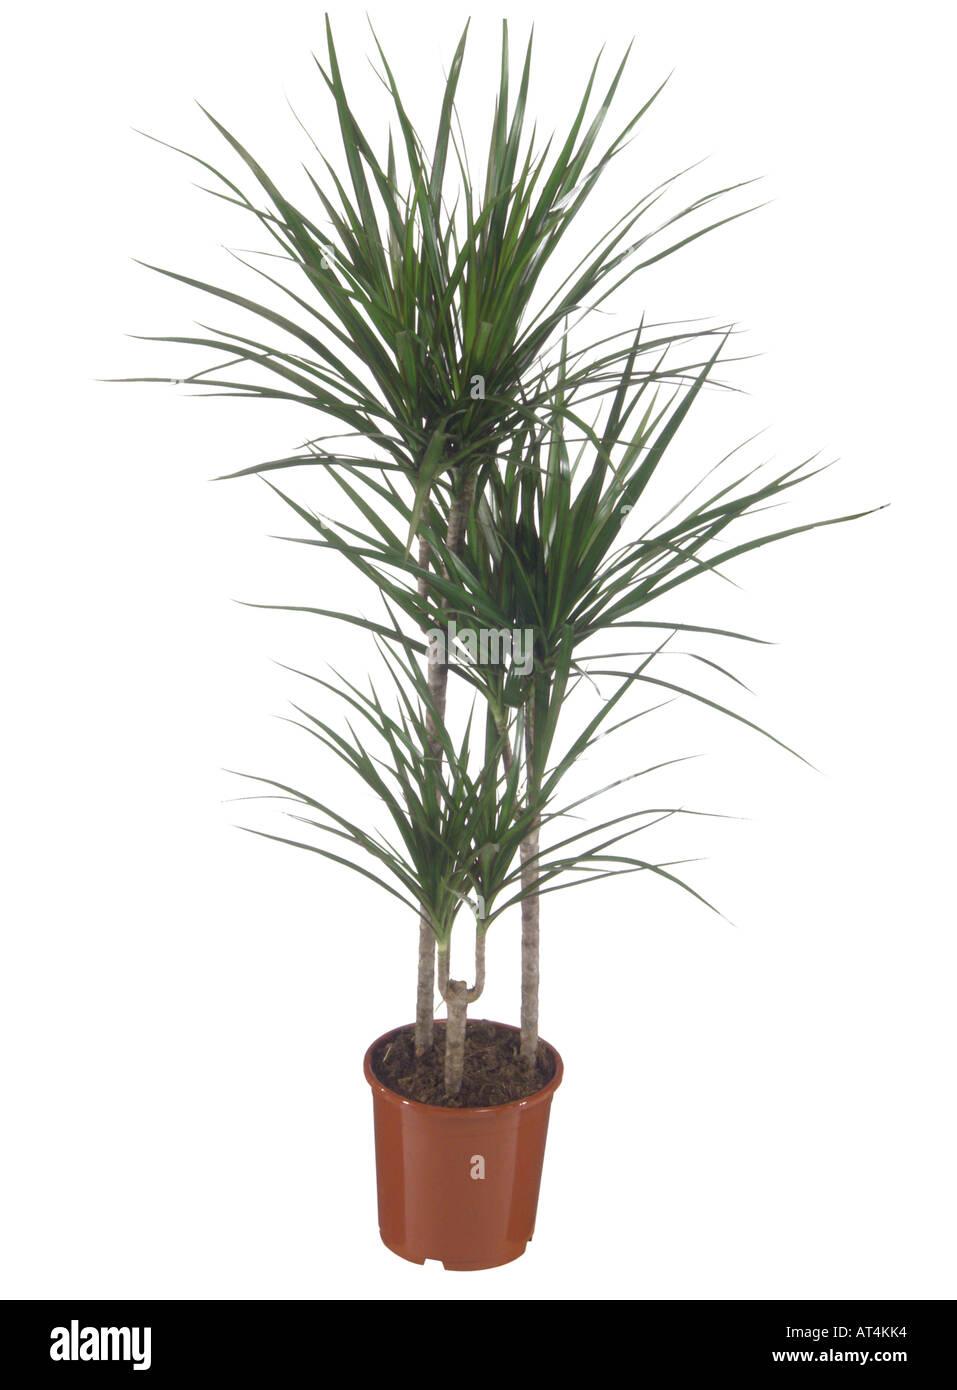 http://c8.alamy.com/comp/AT4KK4/dragon-tree-dracaena-marginata-potted-plant-AT4KK4.jpg Dracaena